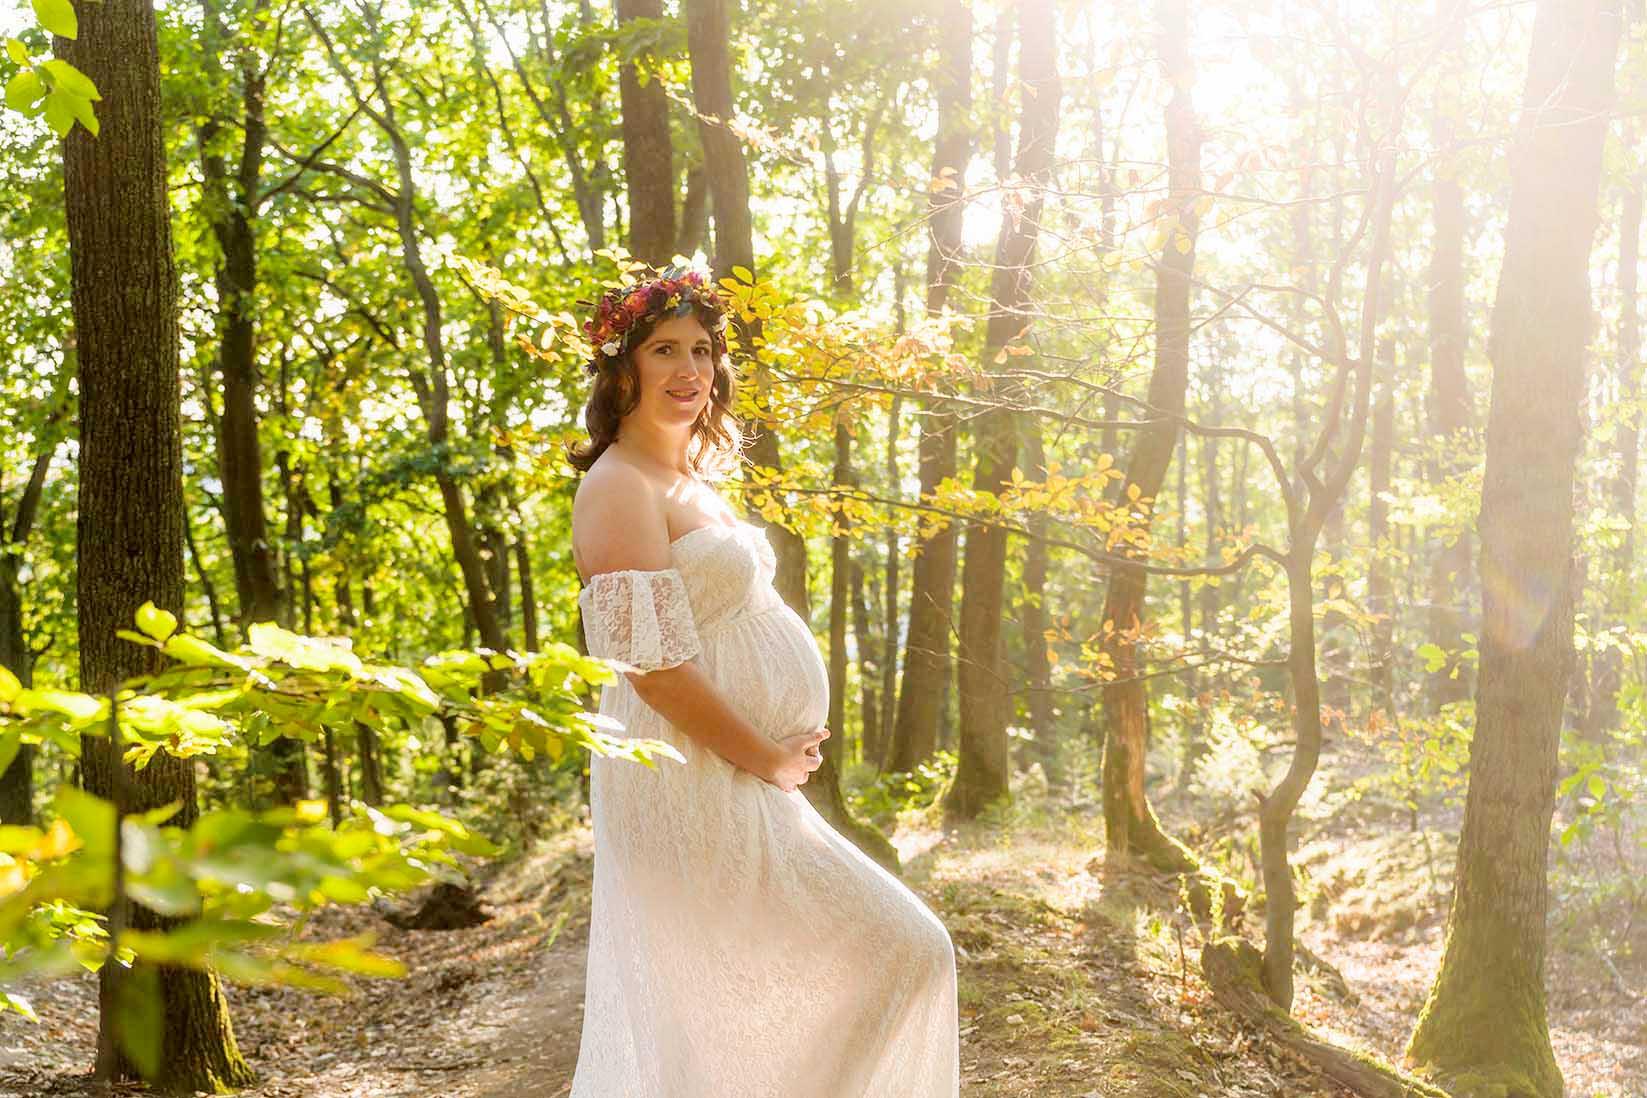 babybauchfotos-schwangerschaftsfotos-fotograf-weinheim-mannheim-heidelberg